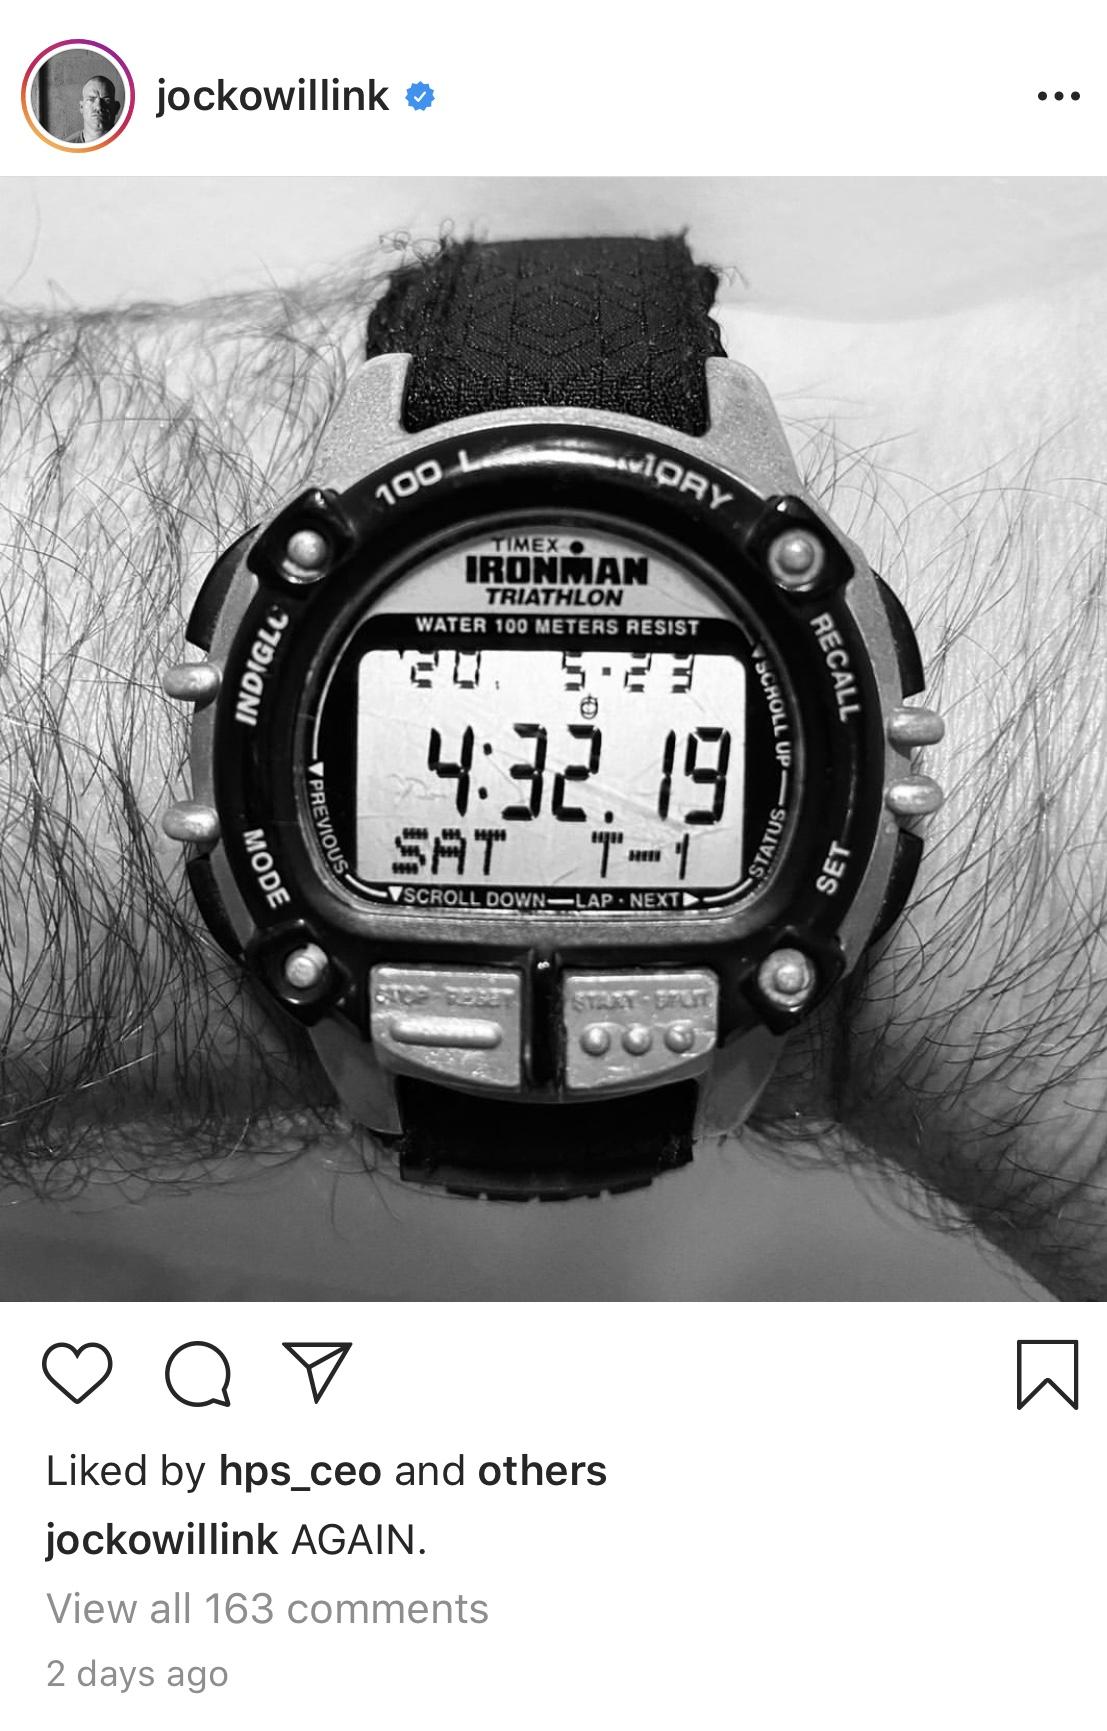 Jocko Willink's Timex